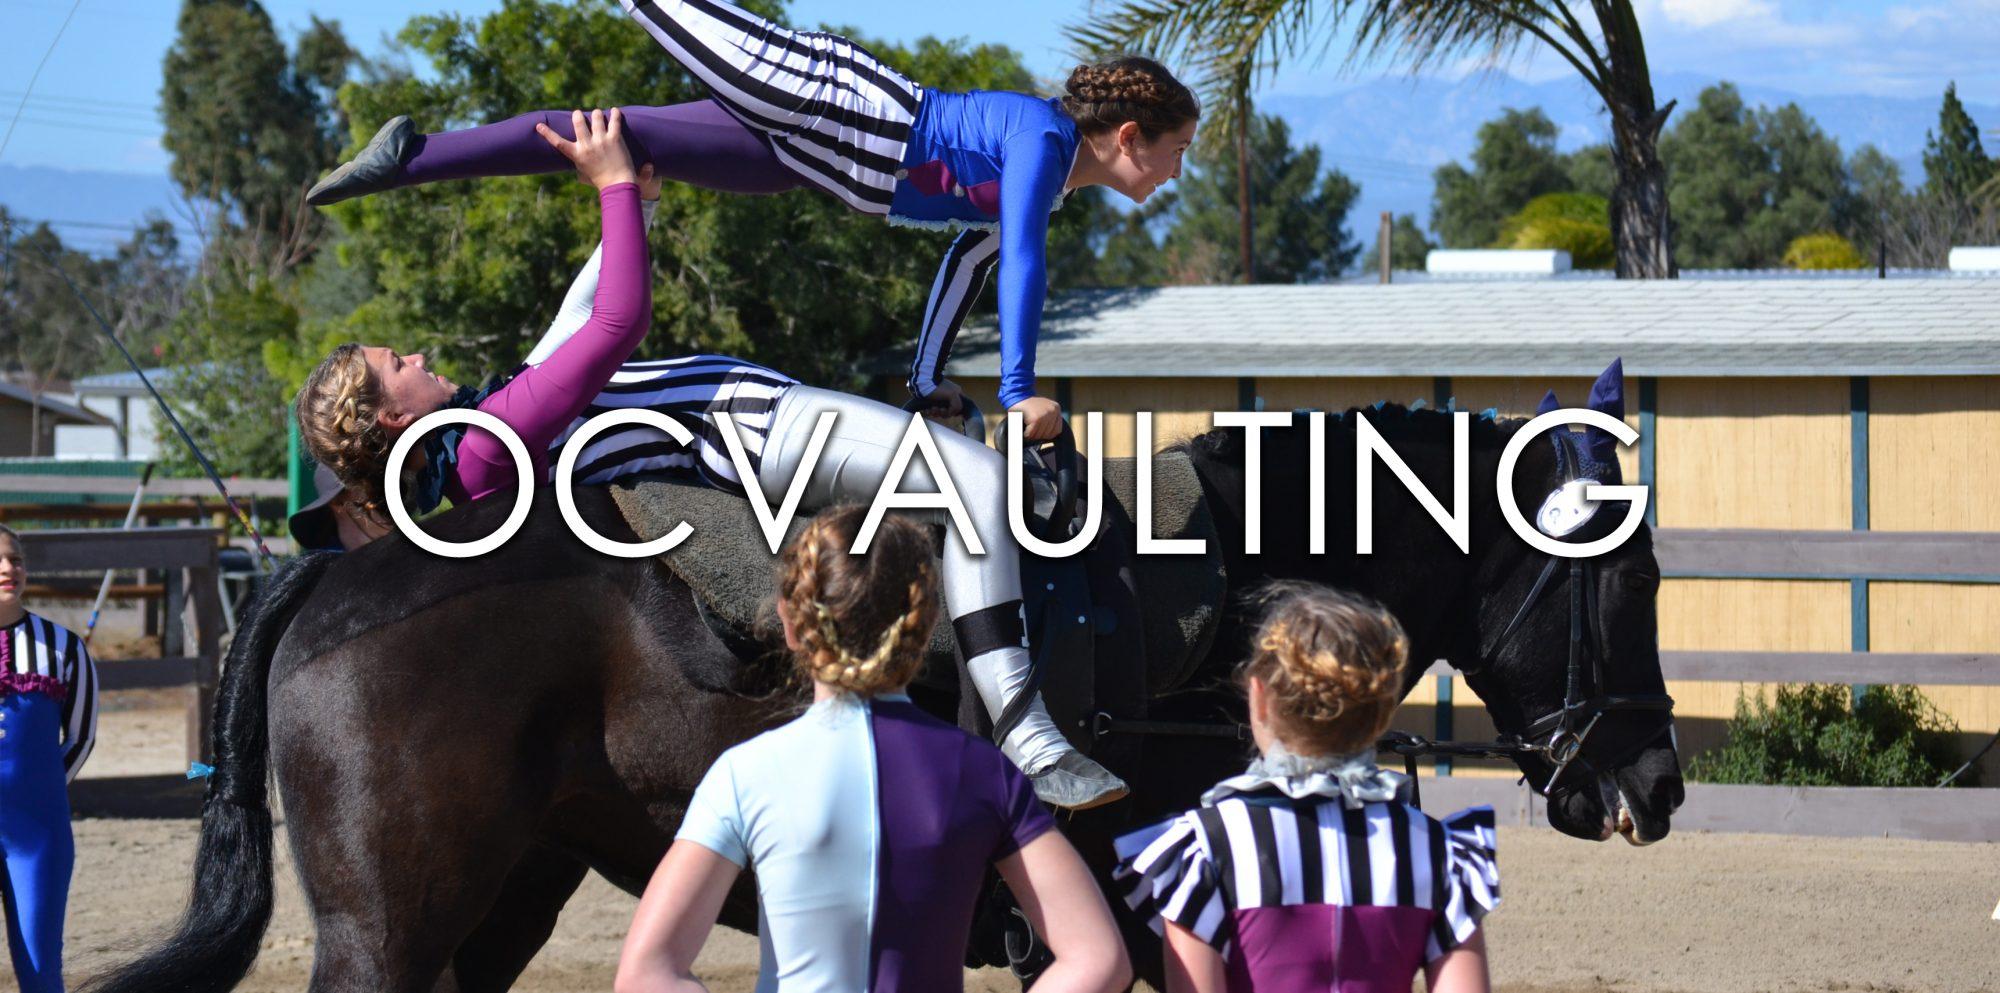 OC Vaulting